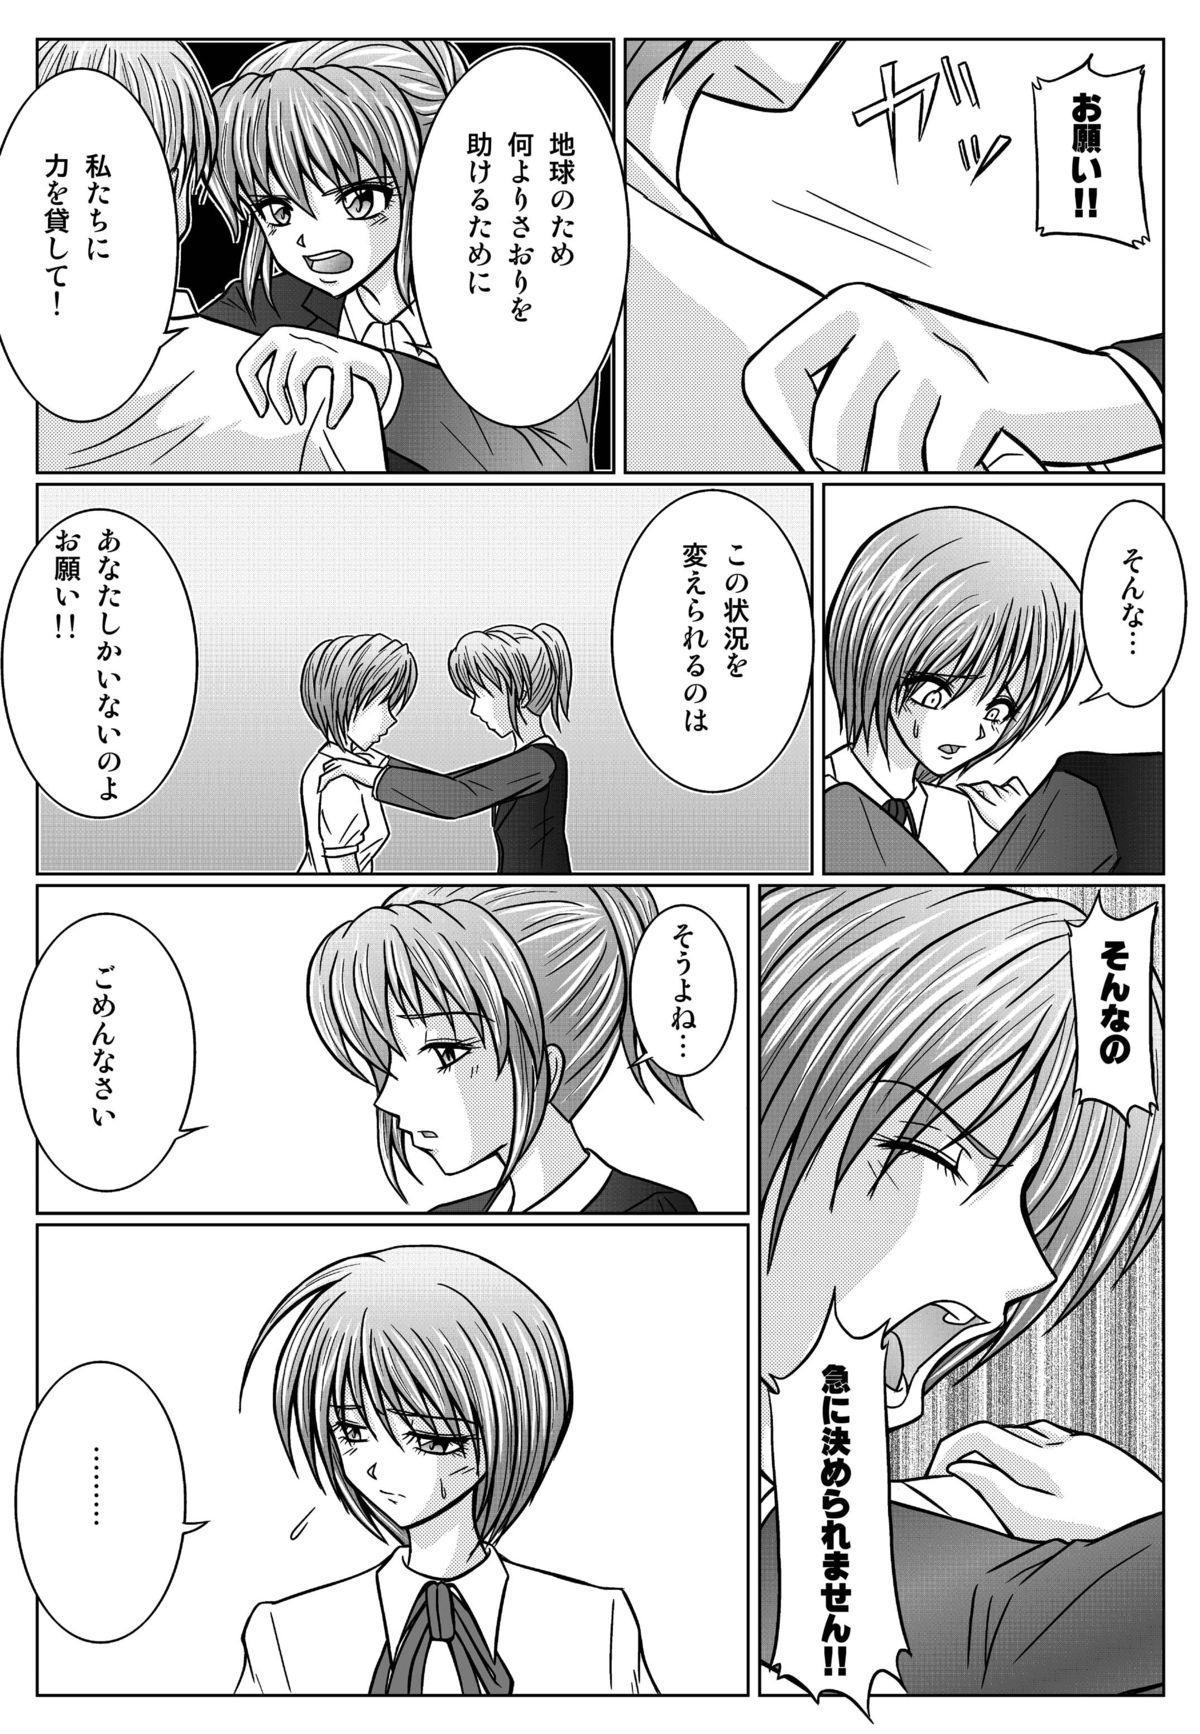 [Macxe's (monmon)] Tokubousentai Dinaranger ~Heroine Kairaku Sennou Keikaku~ Vol.01/02/03 (Renkaban) [Digital] 79